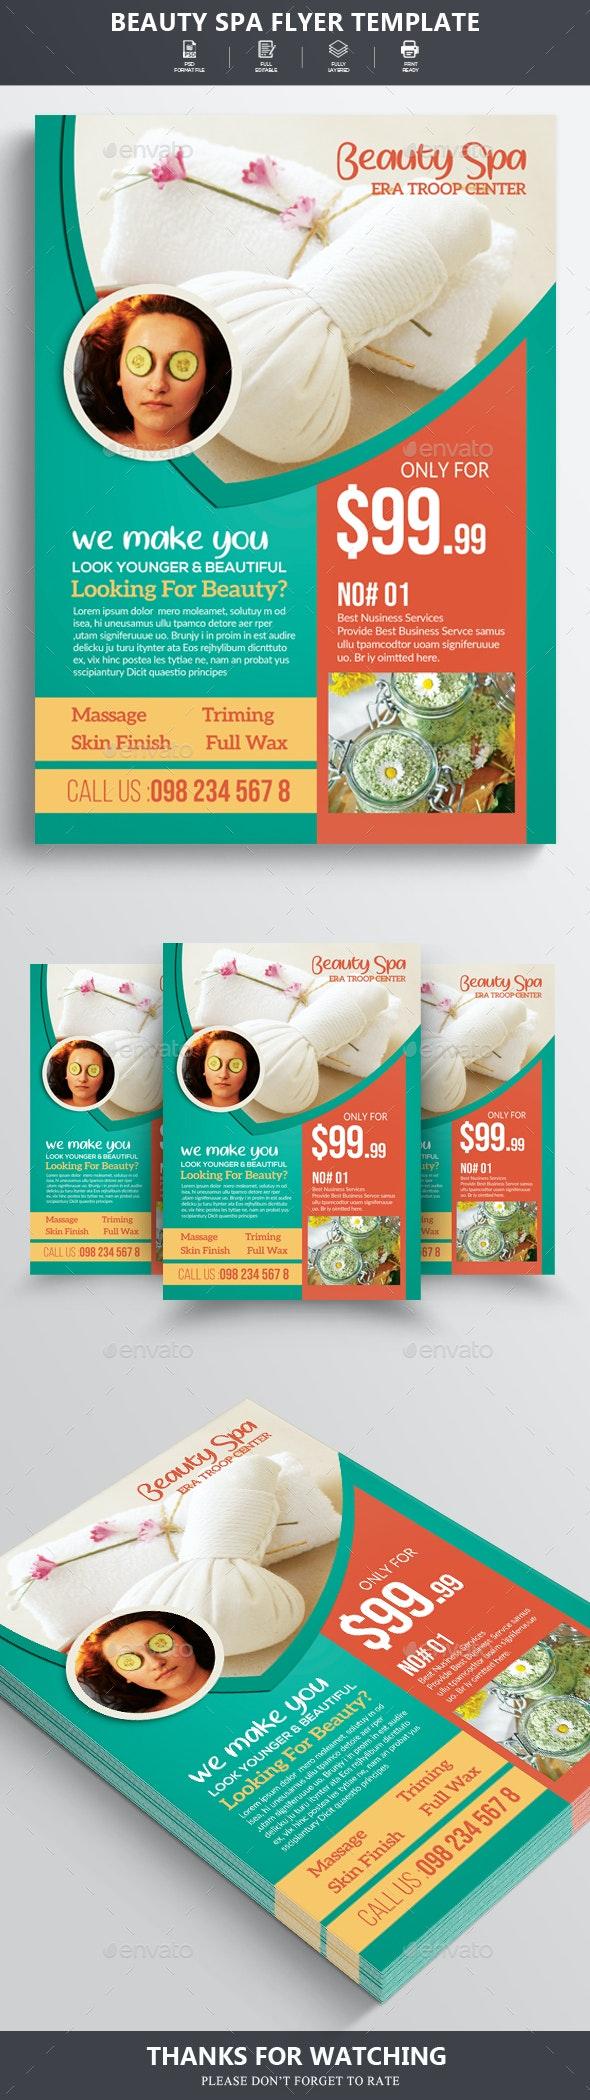 Beauty Spa Flyer/Poster - Flyers Print Templates